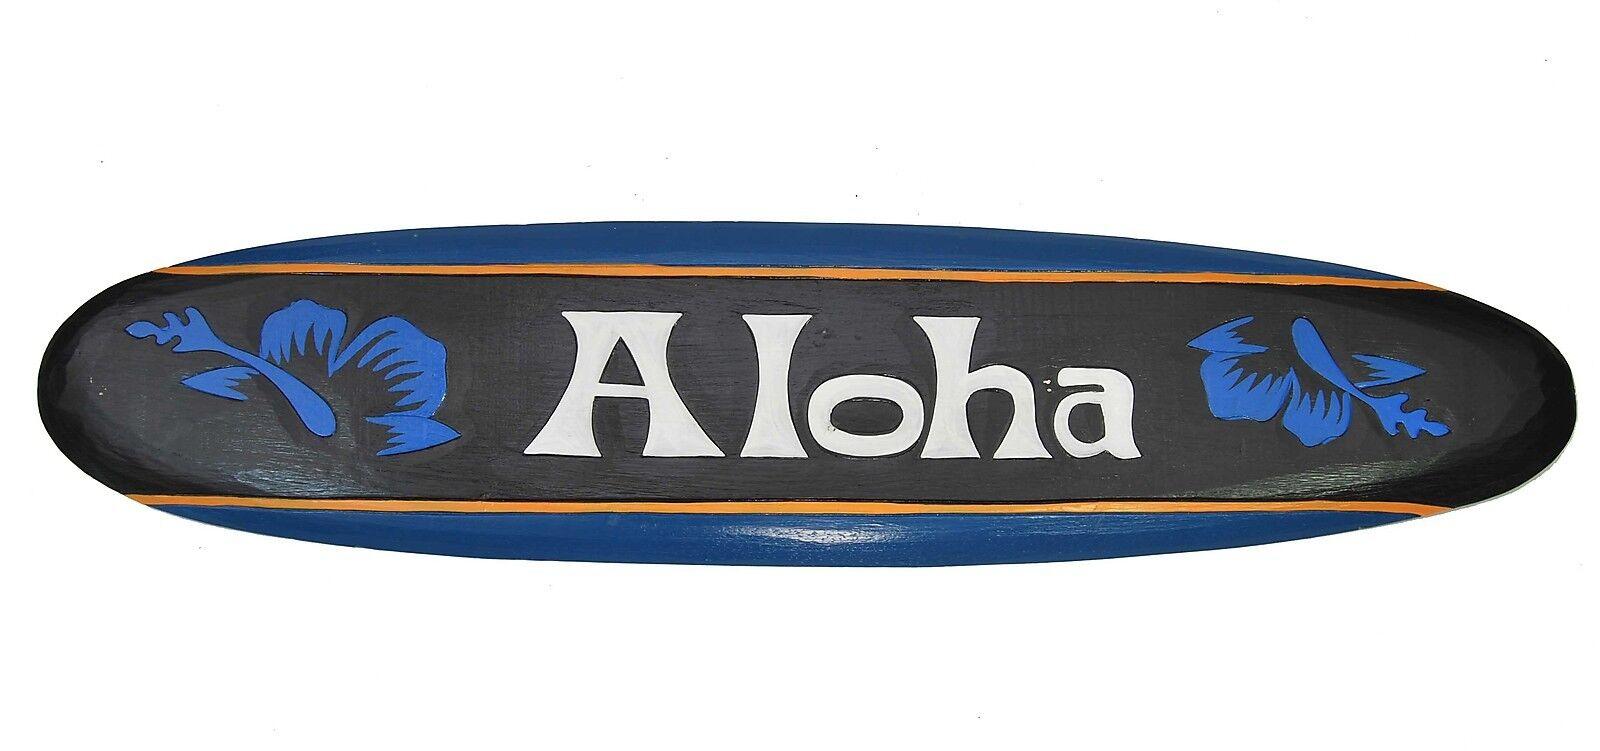 Surfboard zum Aufhängen 100cm Holz Board als Deko Wellenreiten Surfbrett